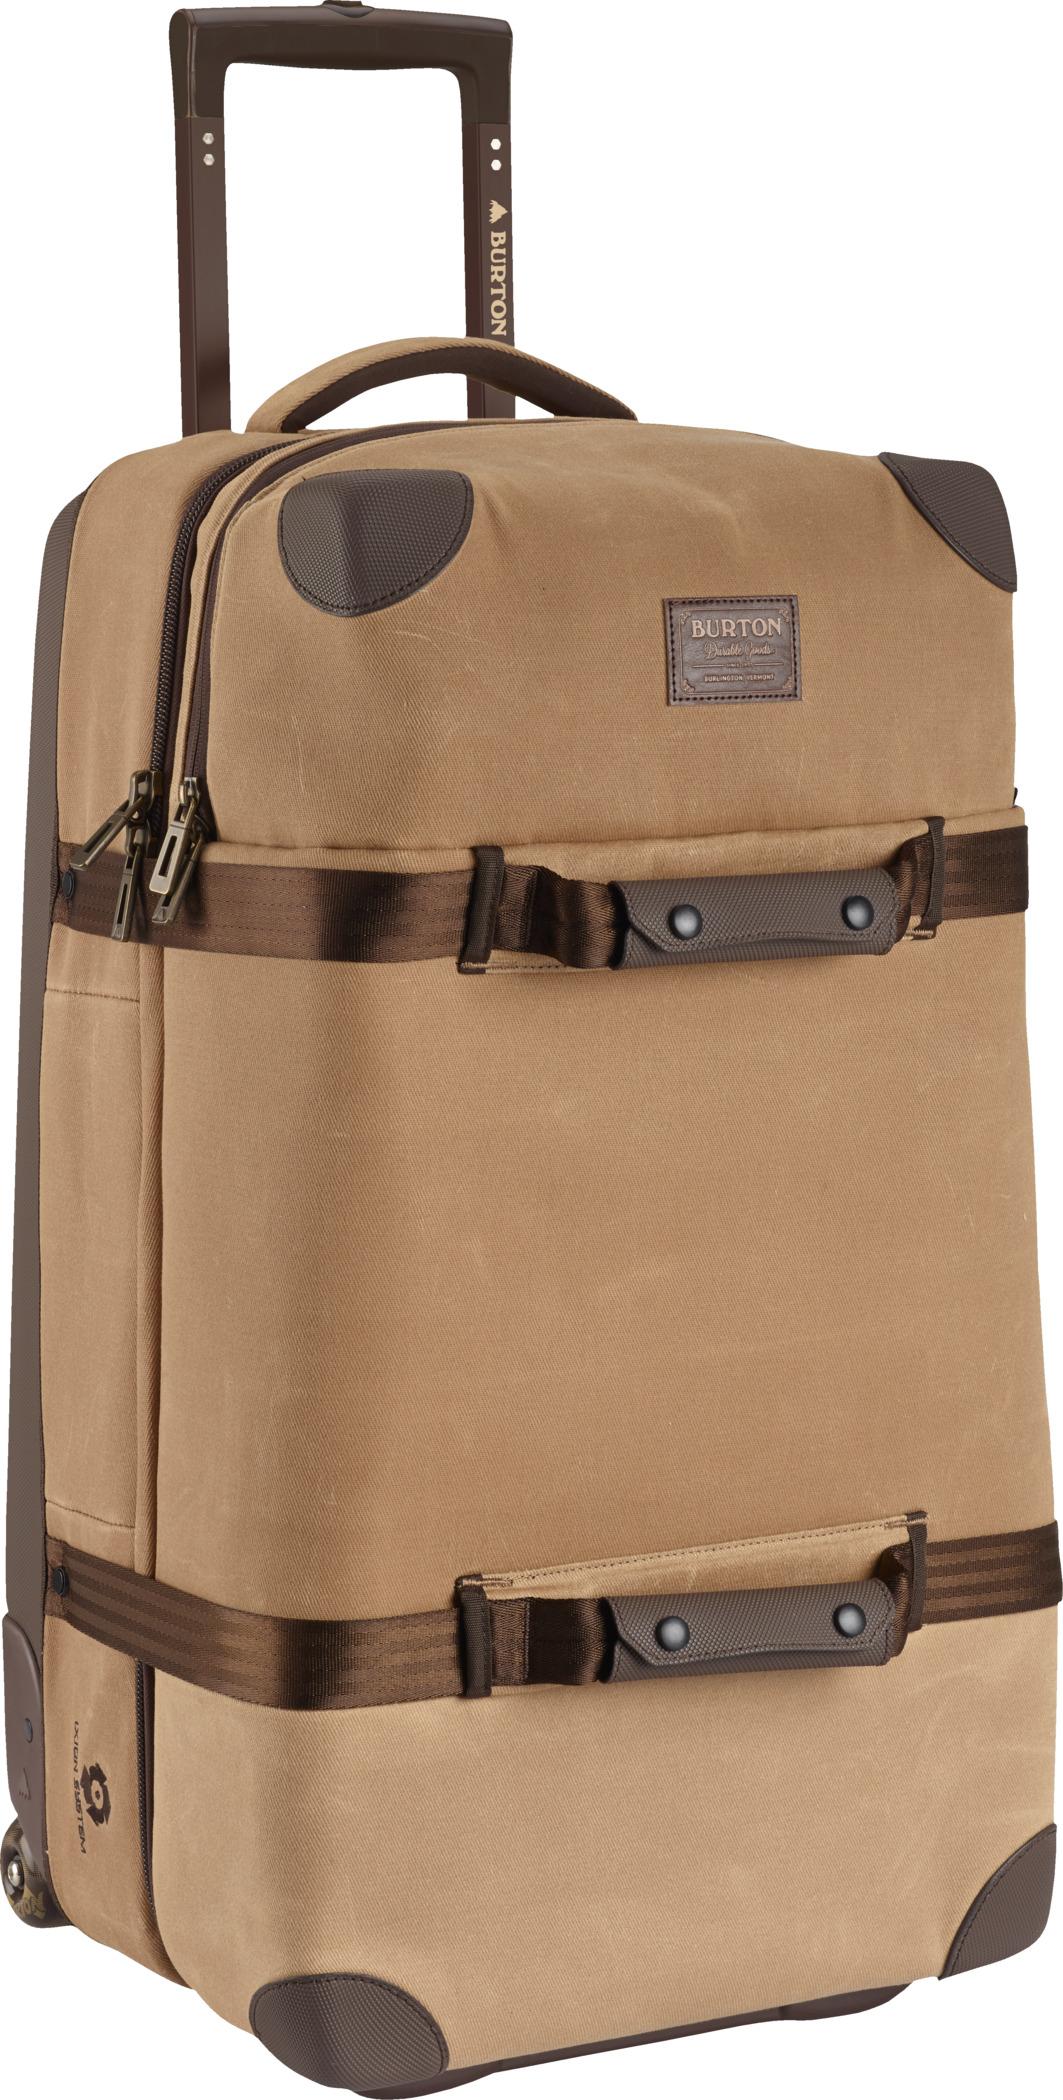 cestovní taška BURTON WHEELIE DOUBLE DECK BEAGLE BRWN WXD CNVS